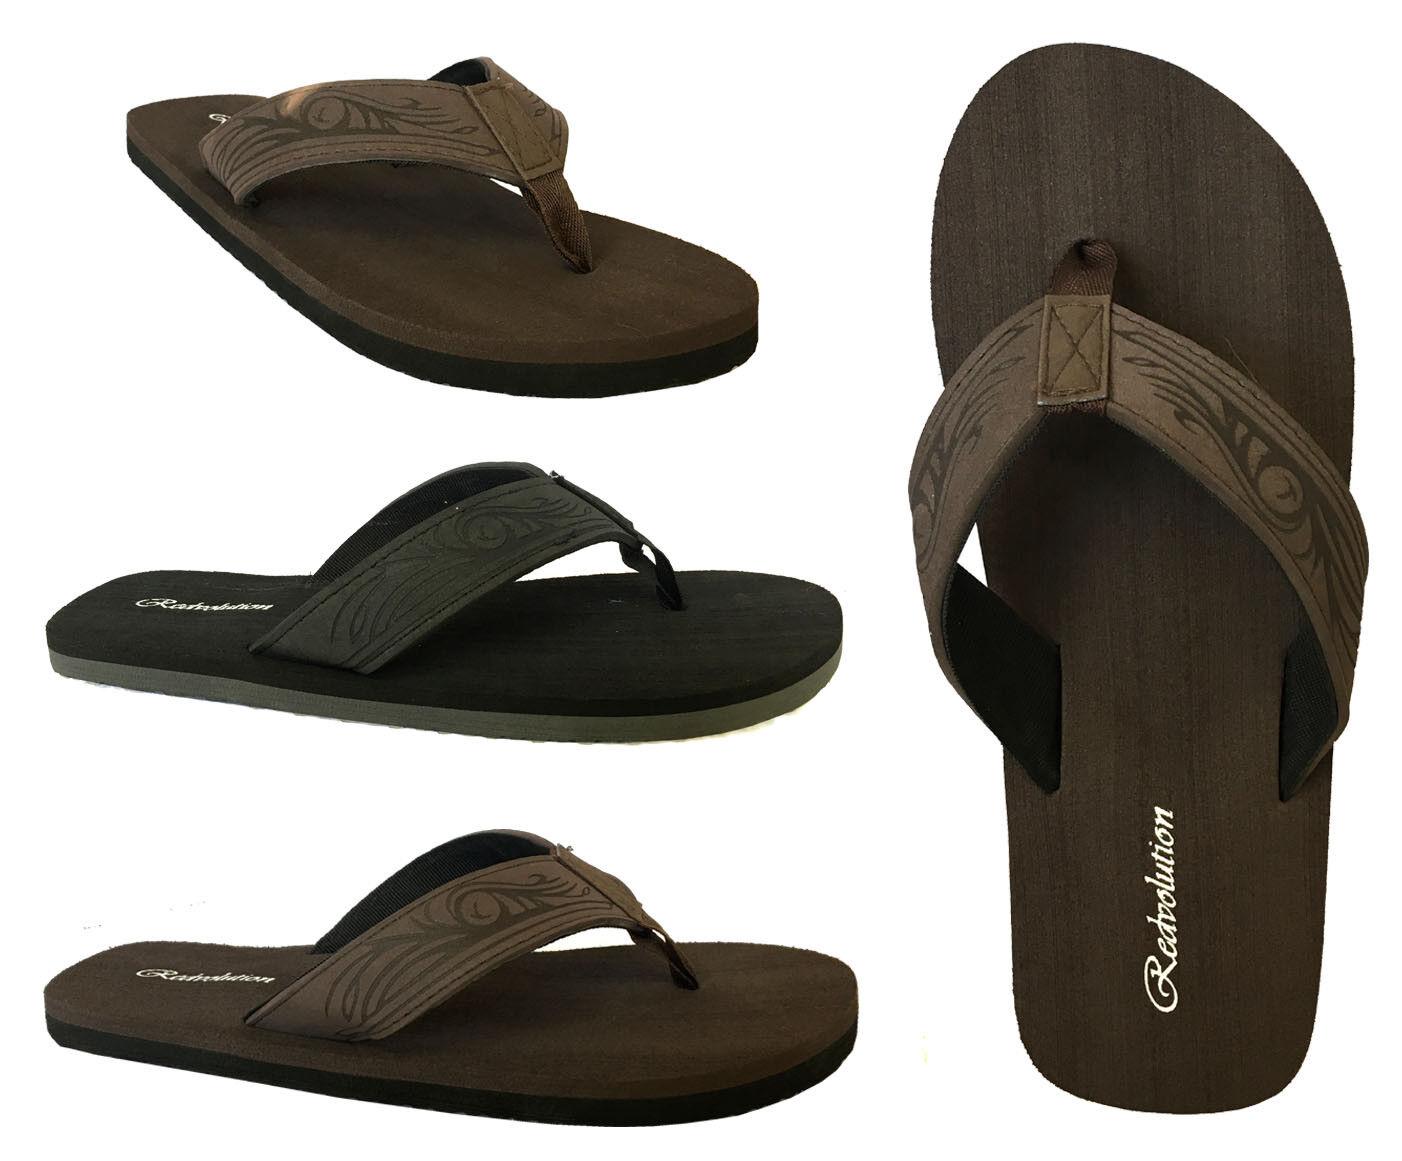 7ff30bd9a053 New MEN TRIBAL Tattoo Sandals Flip Flop Size 7-13 Beach Gym ...